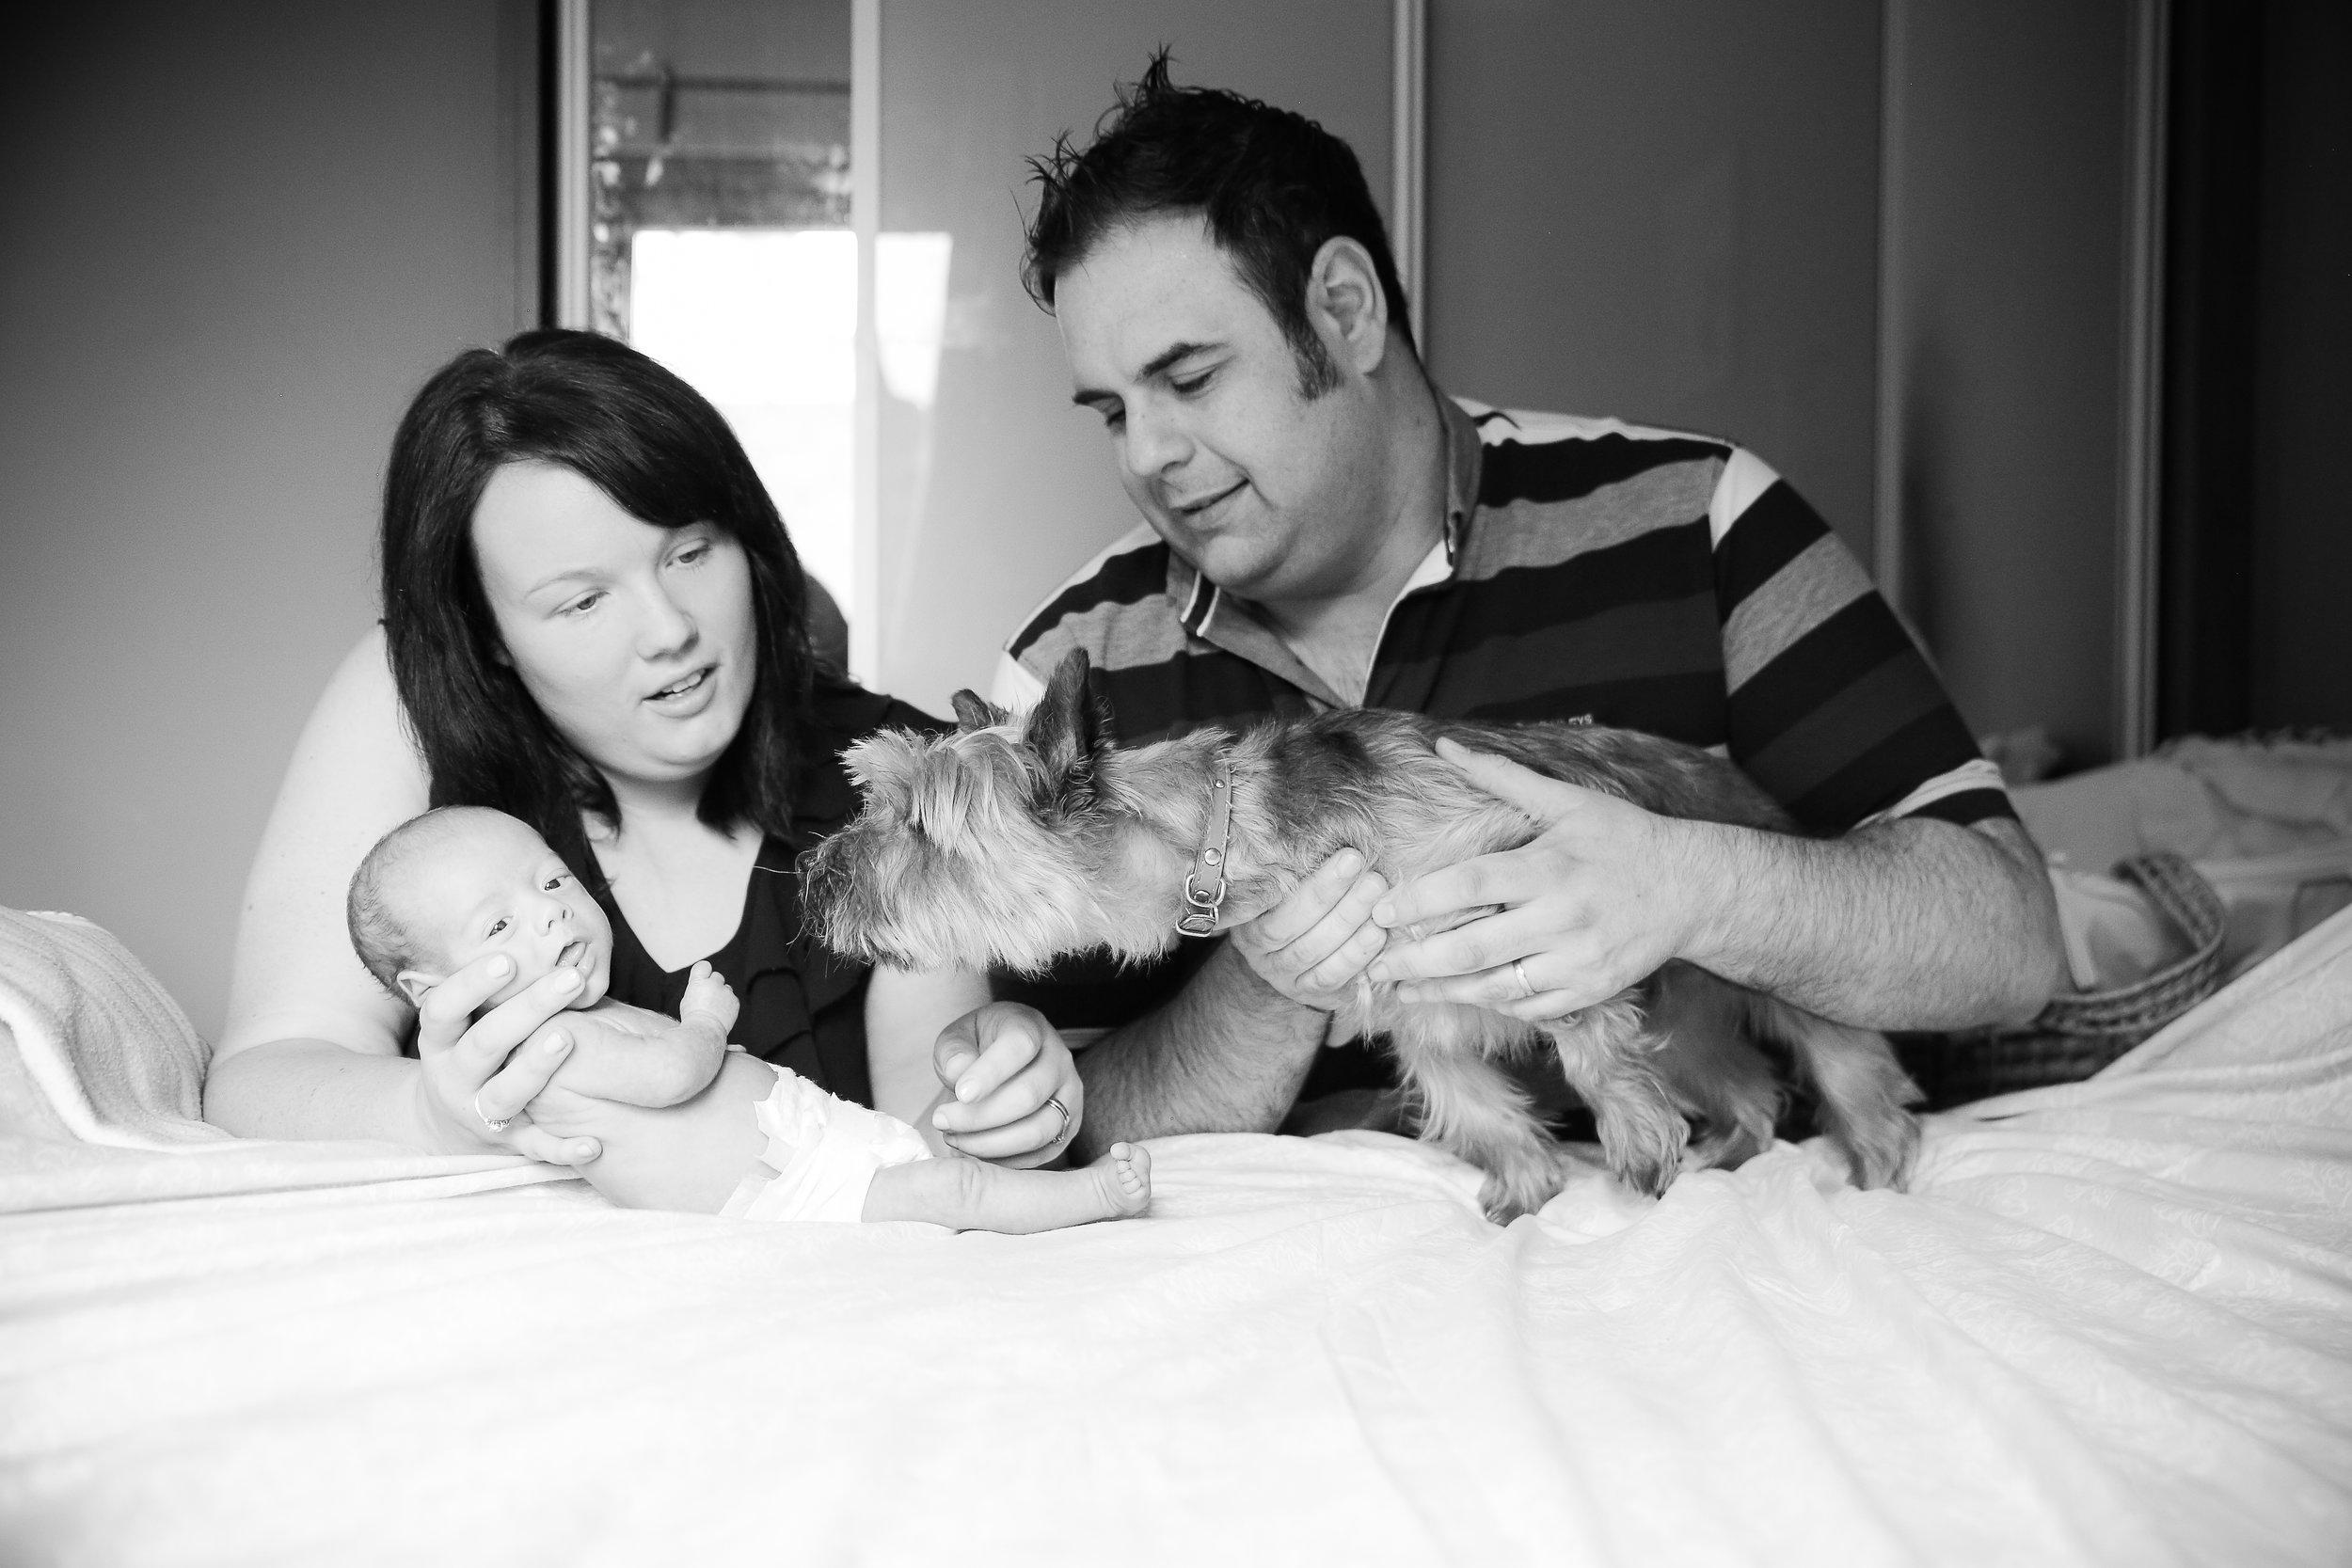 Our little family. Sam, Nicola, Ciarán and Freddie